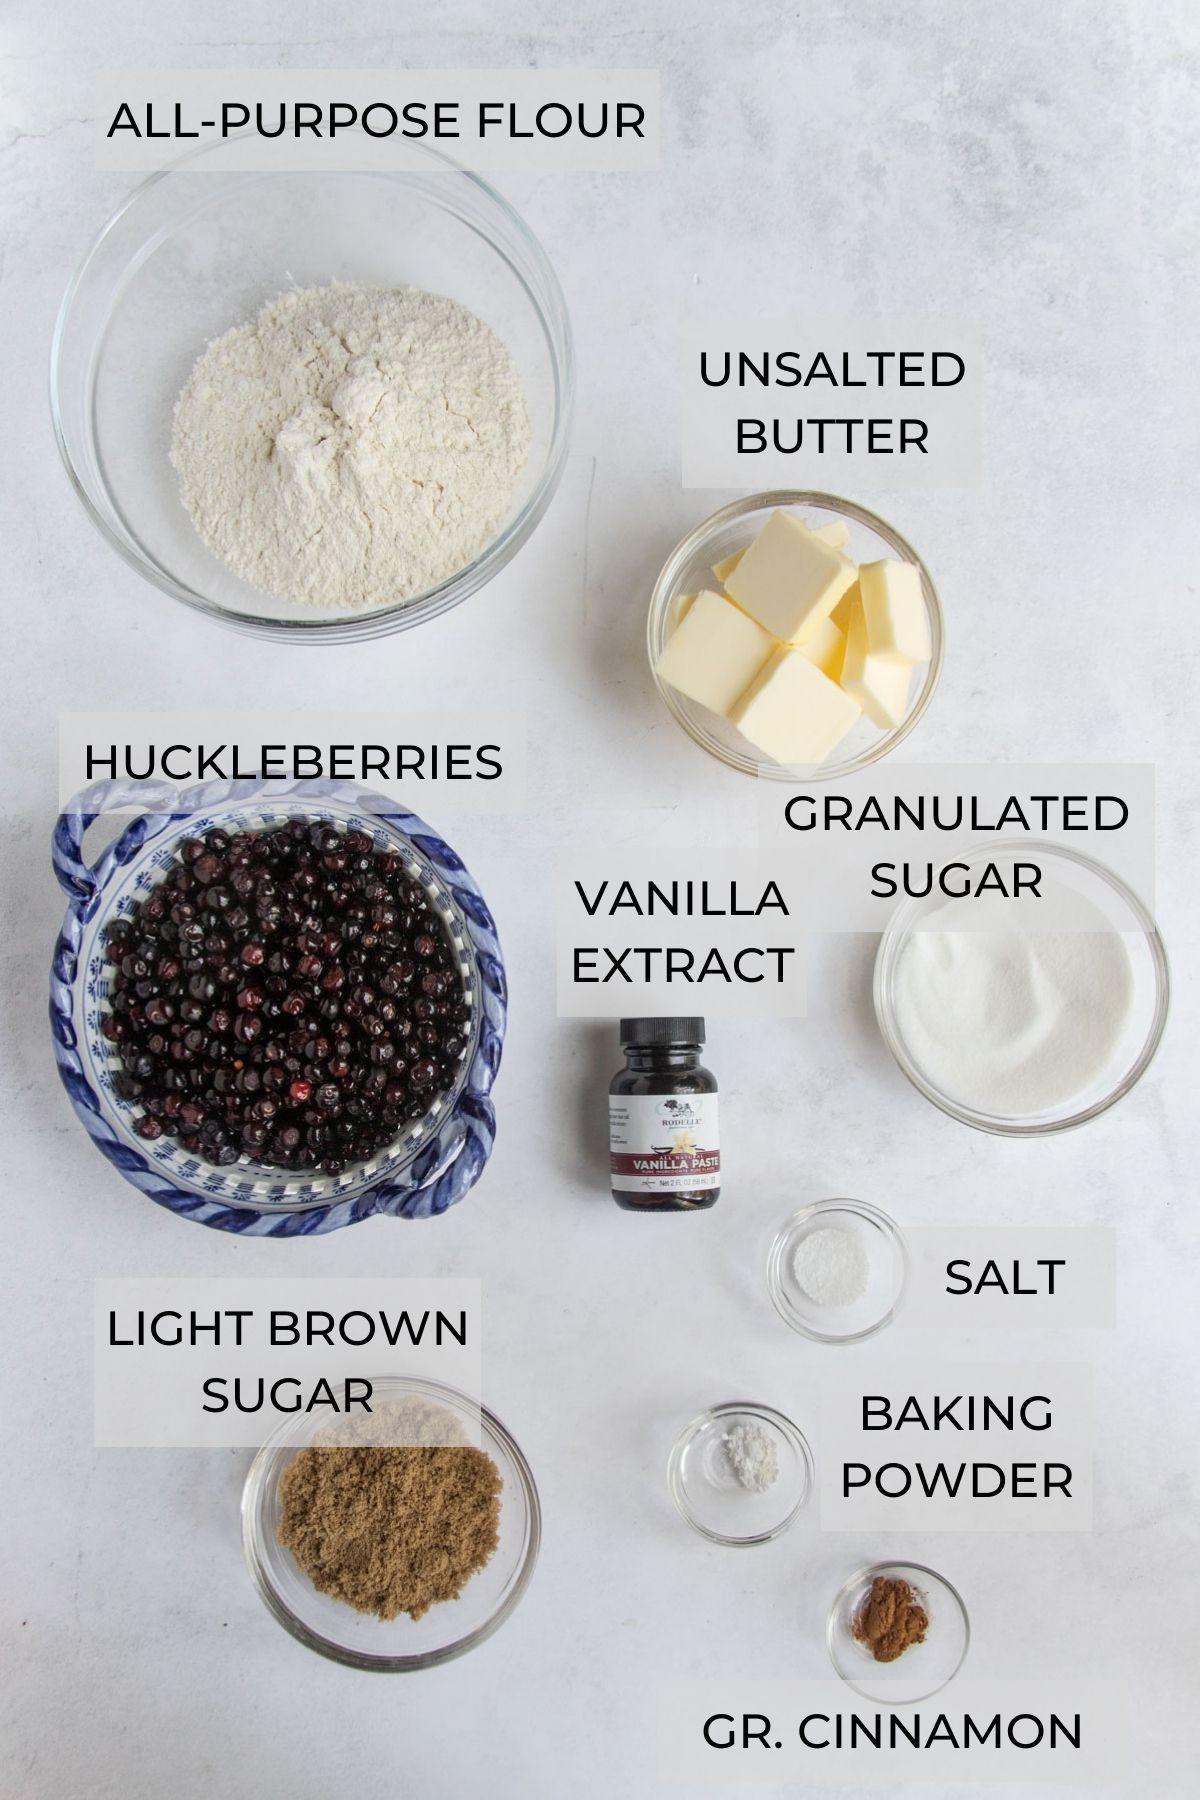 Huckleberry Crumb Bars ingredients - flour, unsalted butter, white sugar, brown sugar, salt, vanilla extract, ground cinnamon, baking powder and fresh huckleberries